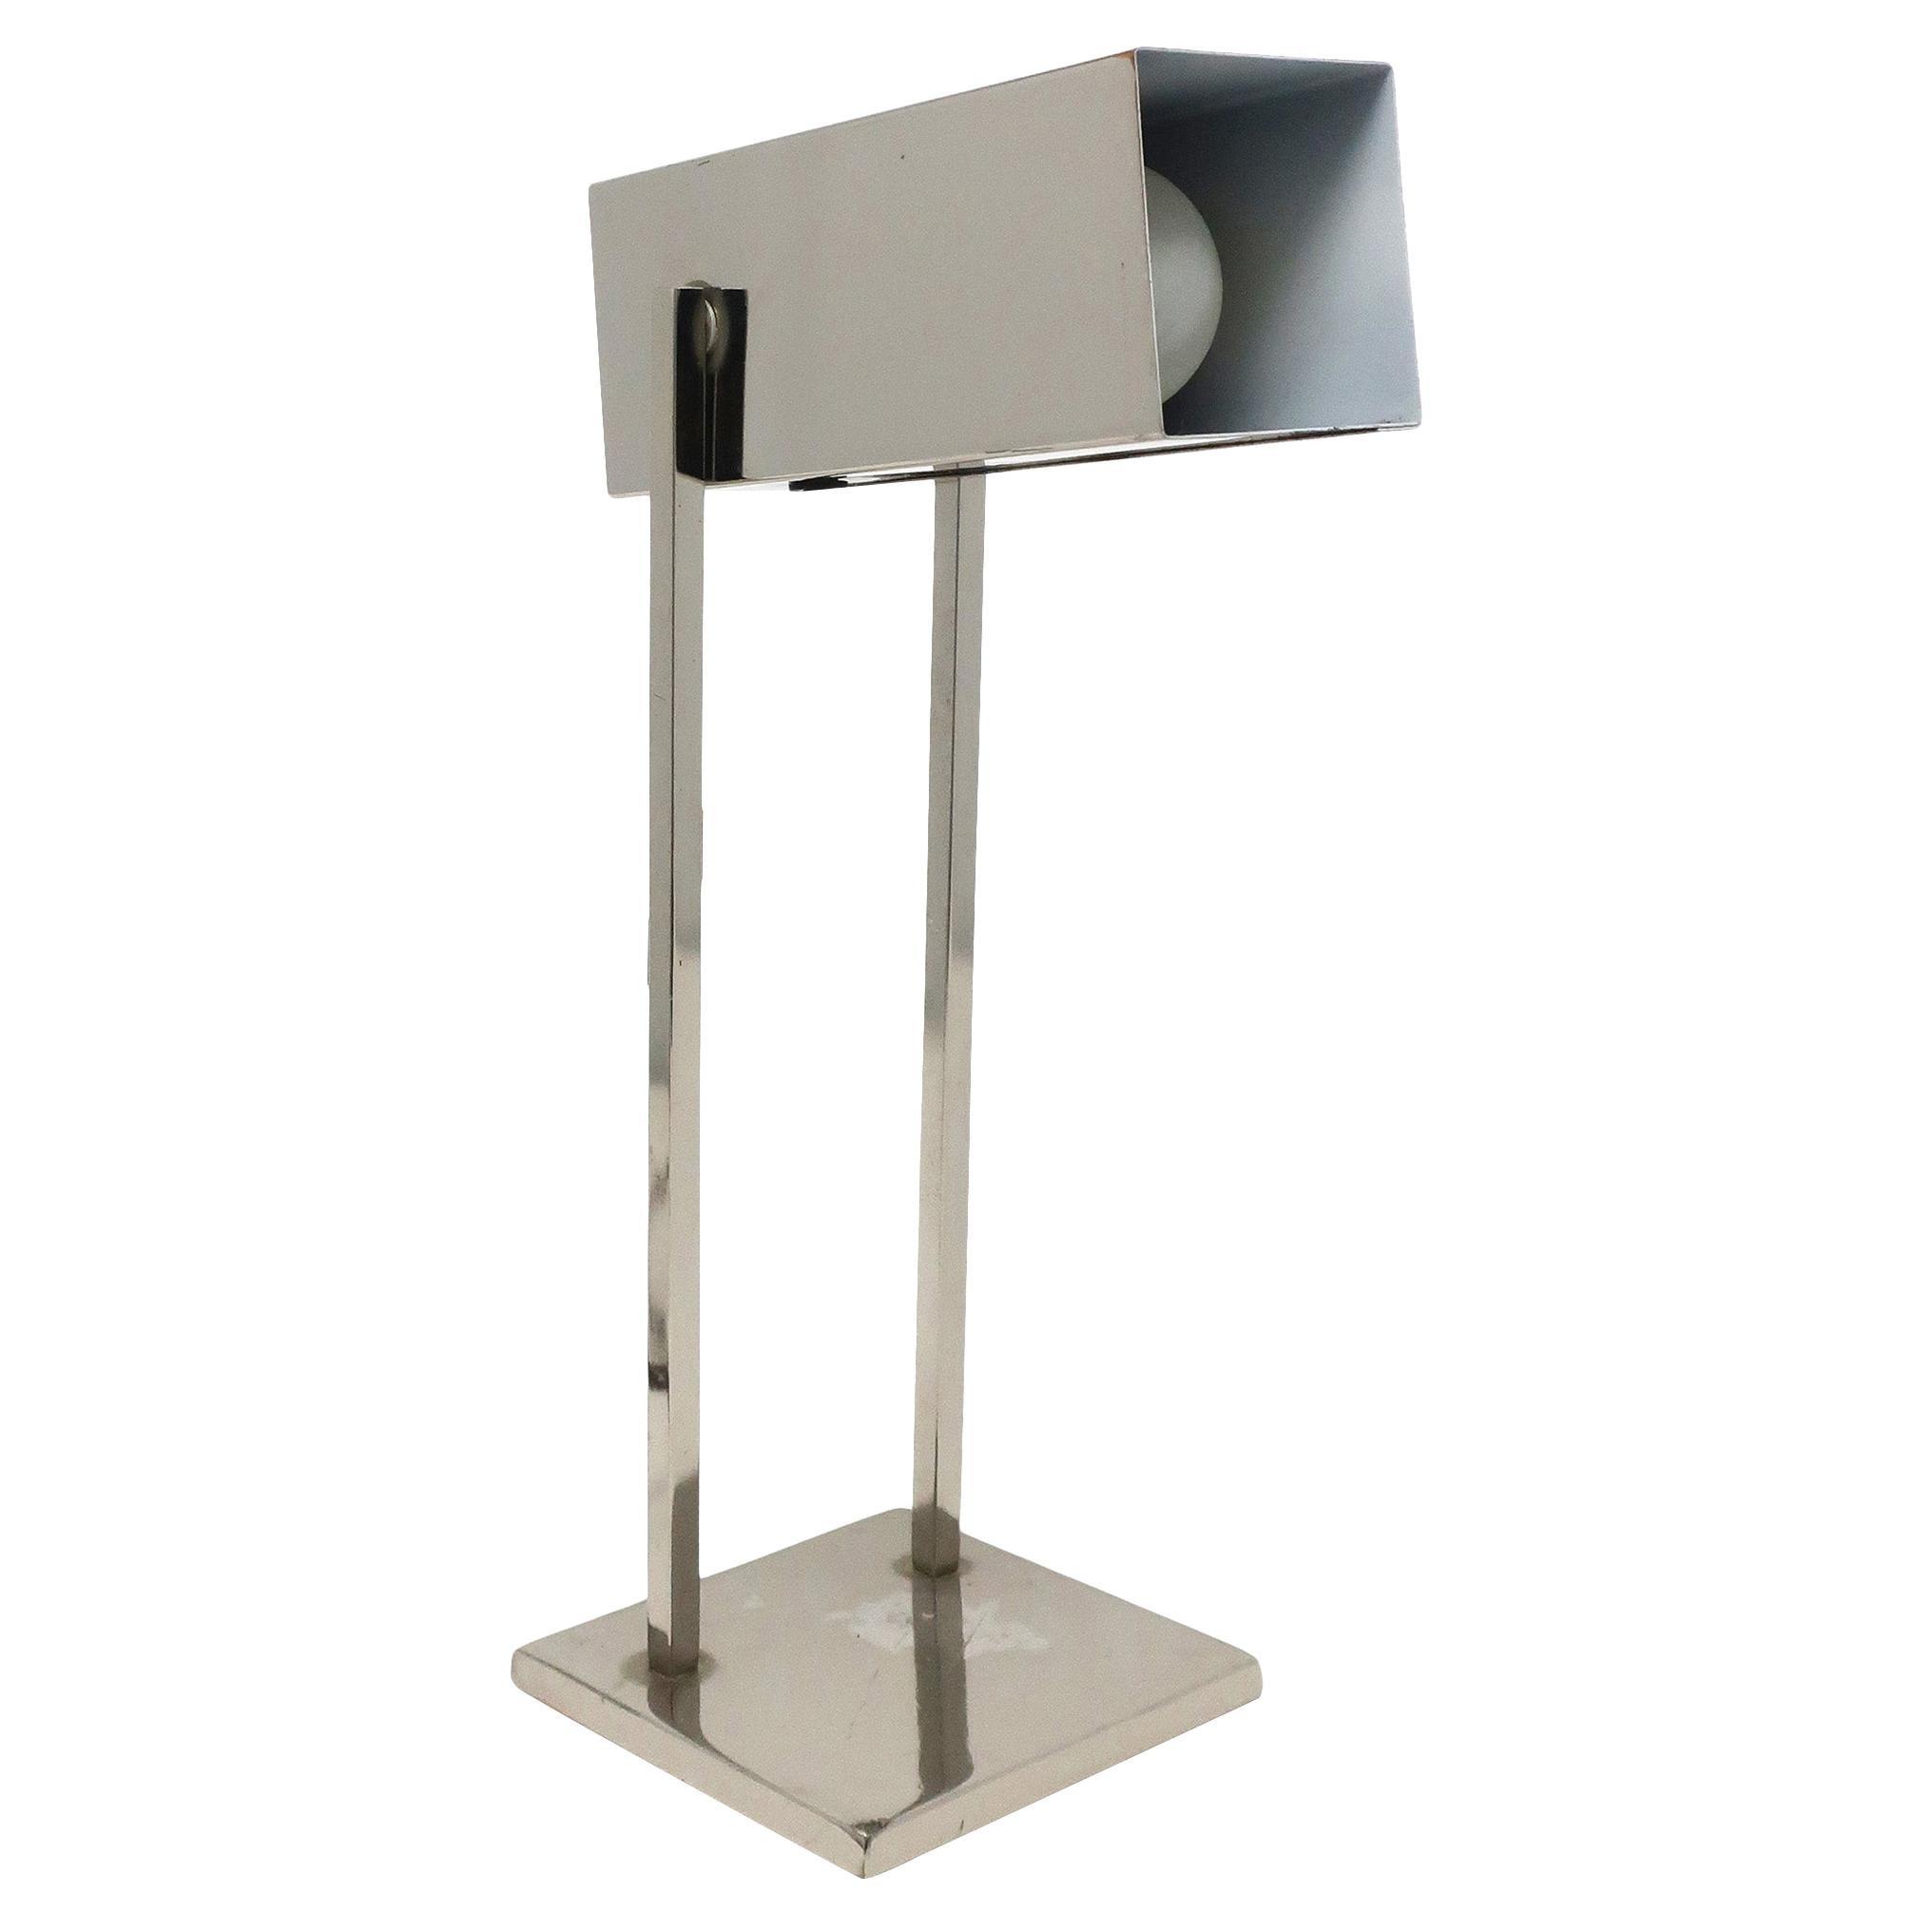 Vintage Mid-Century Modern Chrome Desk Lamp